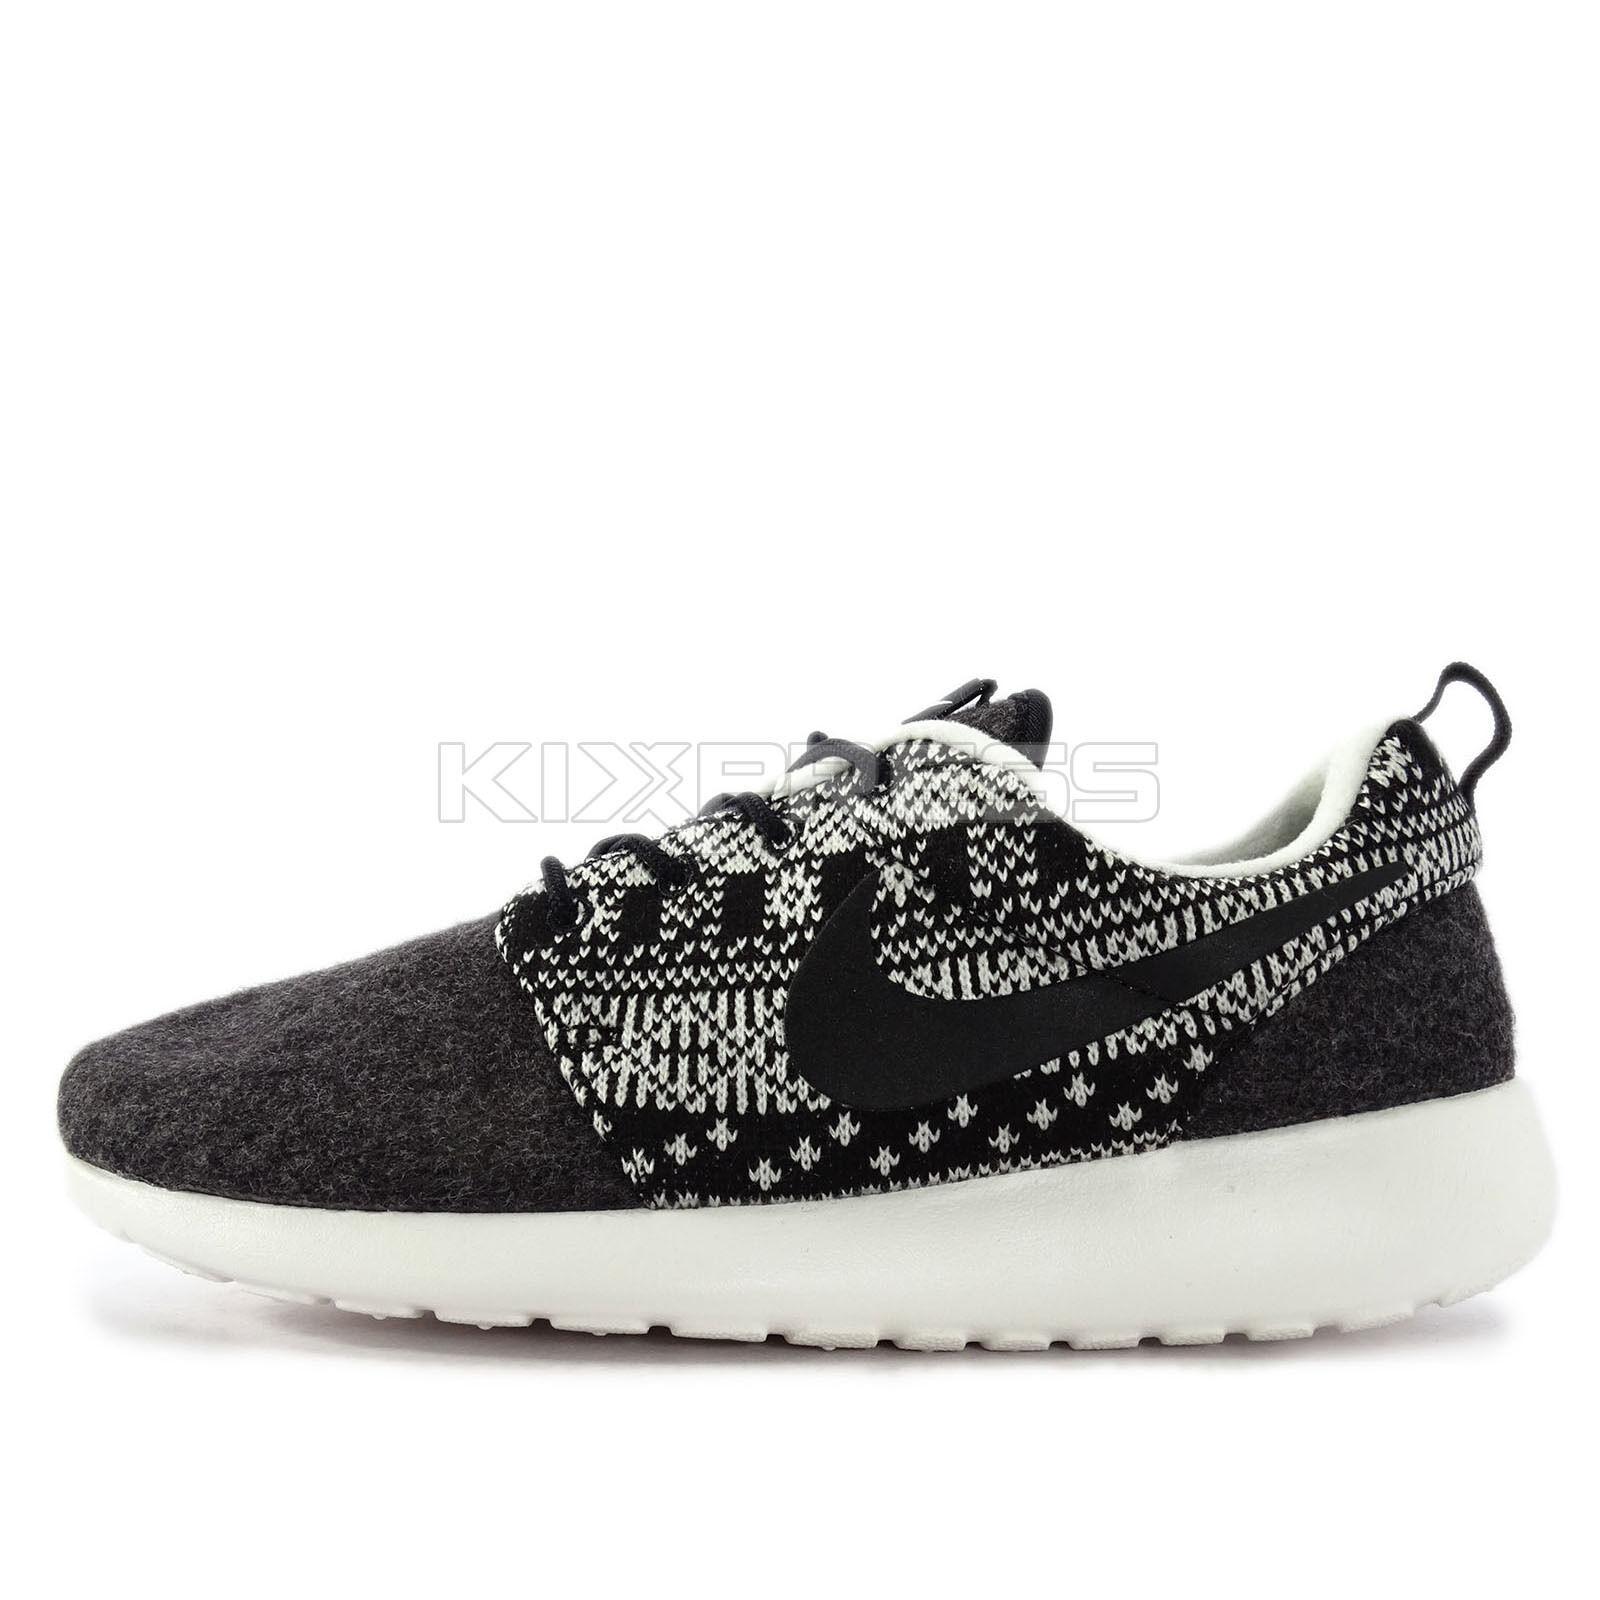 Nike Roshe Courir Ebay Des Femmes De Chandails